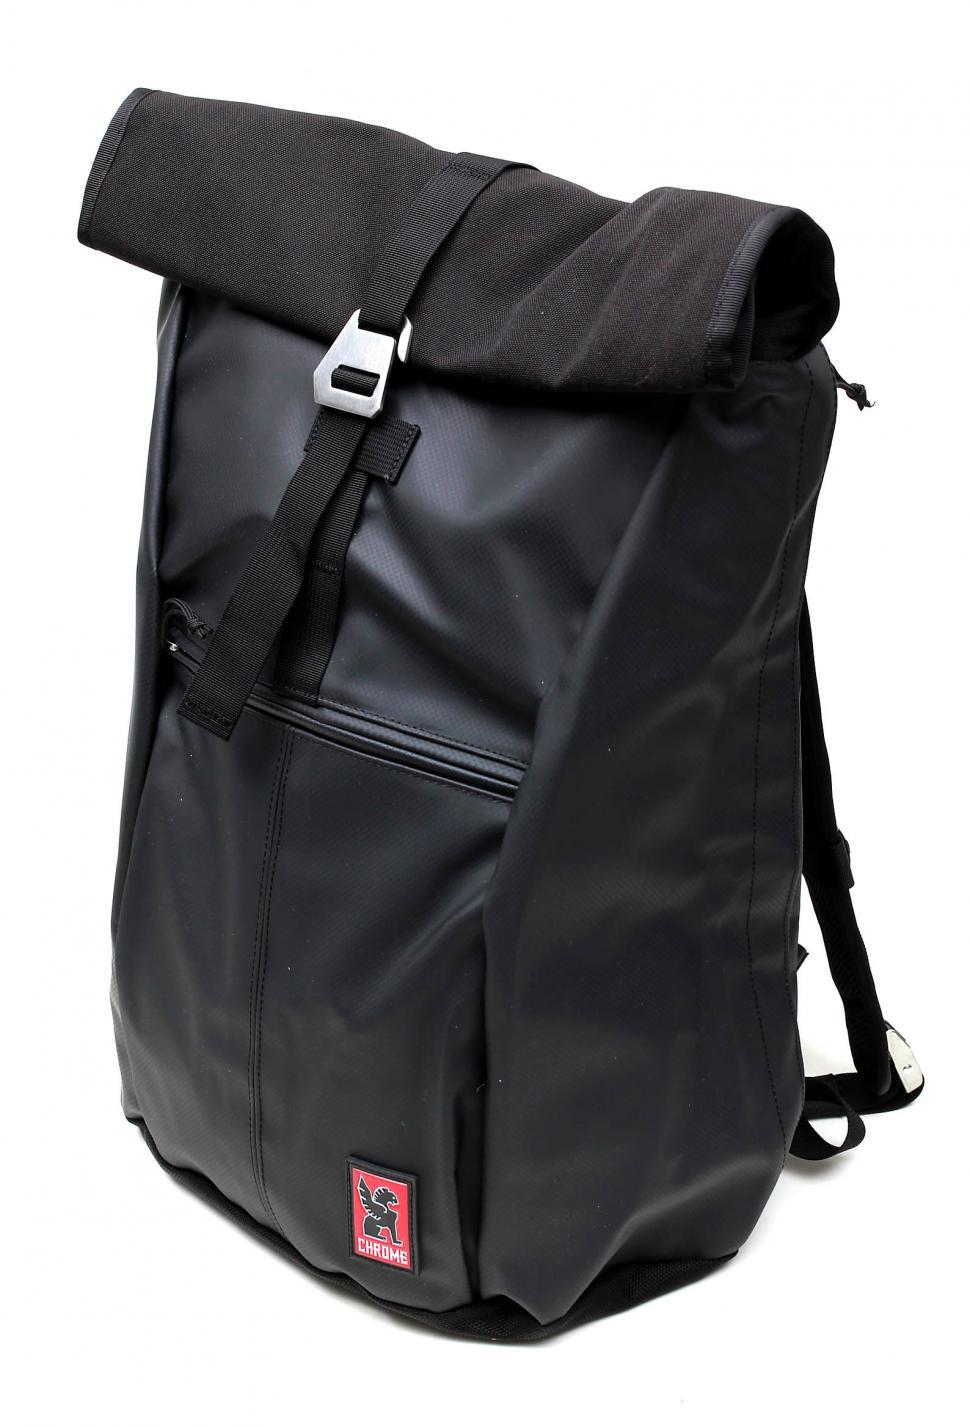 bd5e5a8c1a5d Review  Chrome Yalta rucksack